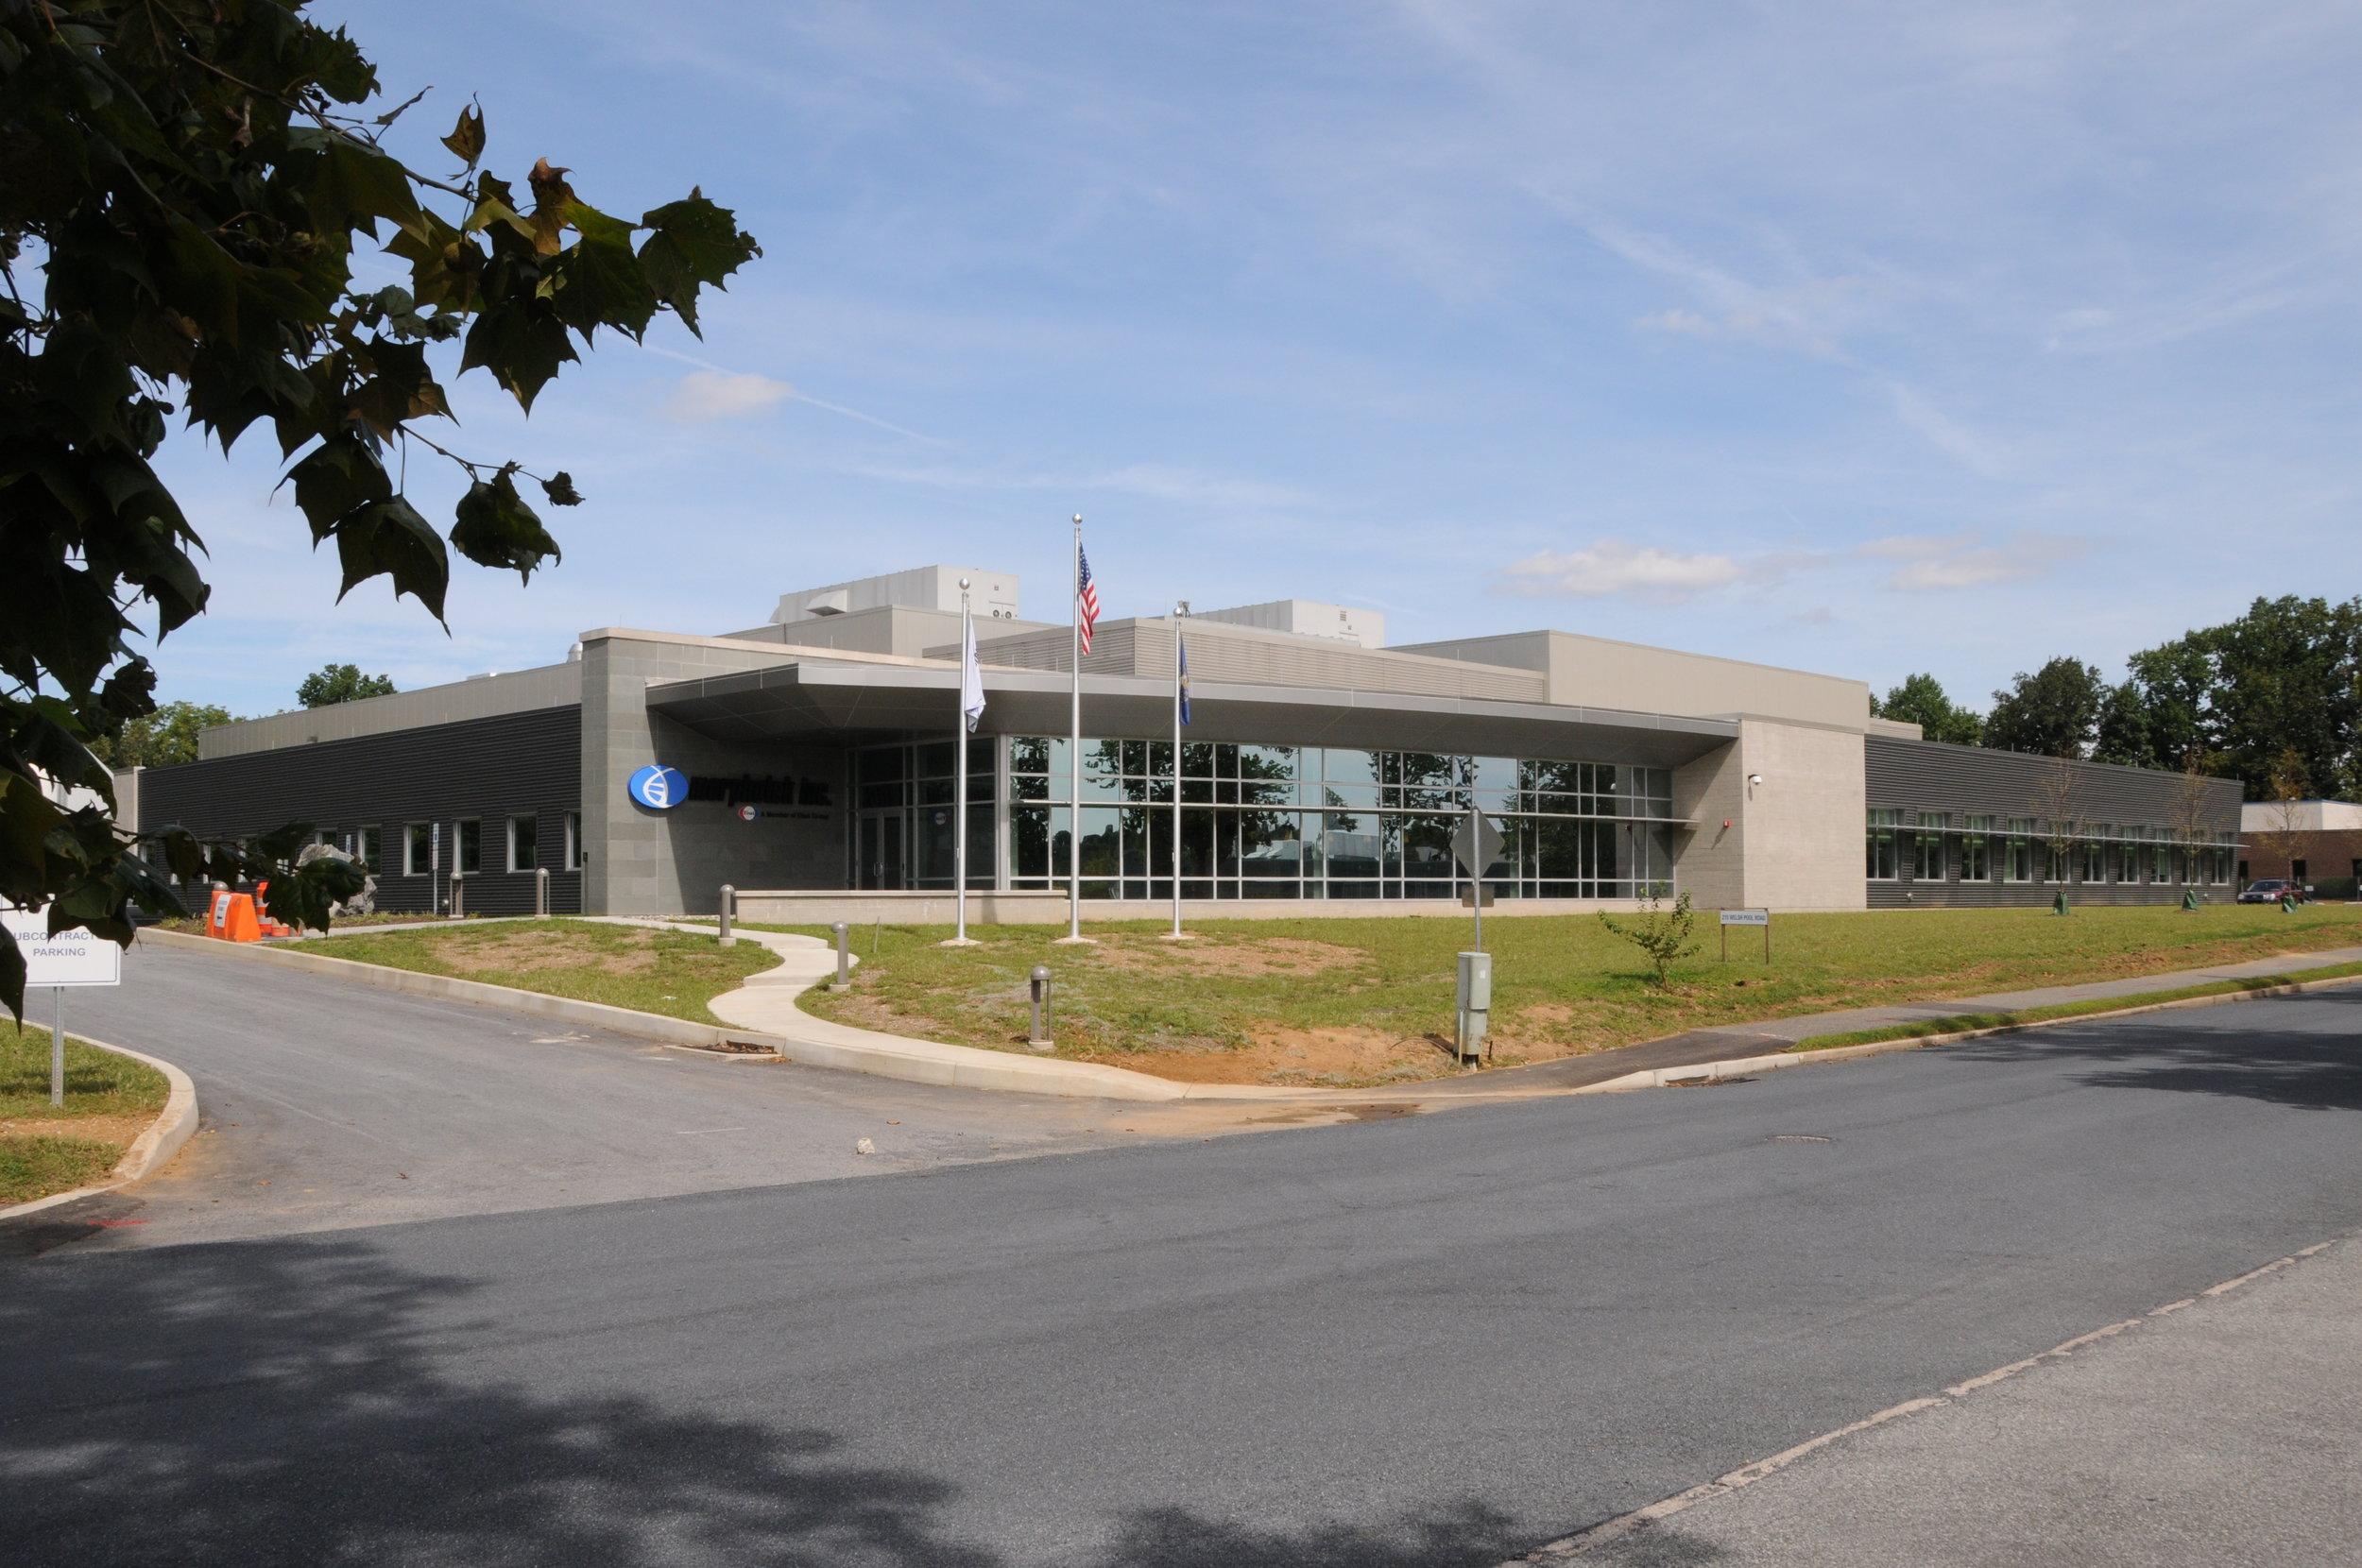 morphotek office lab 091611 (69).JPG